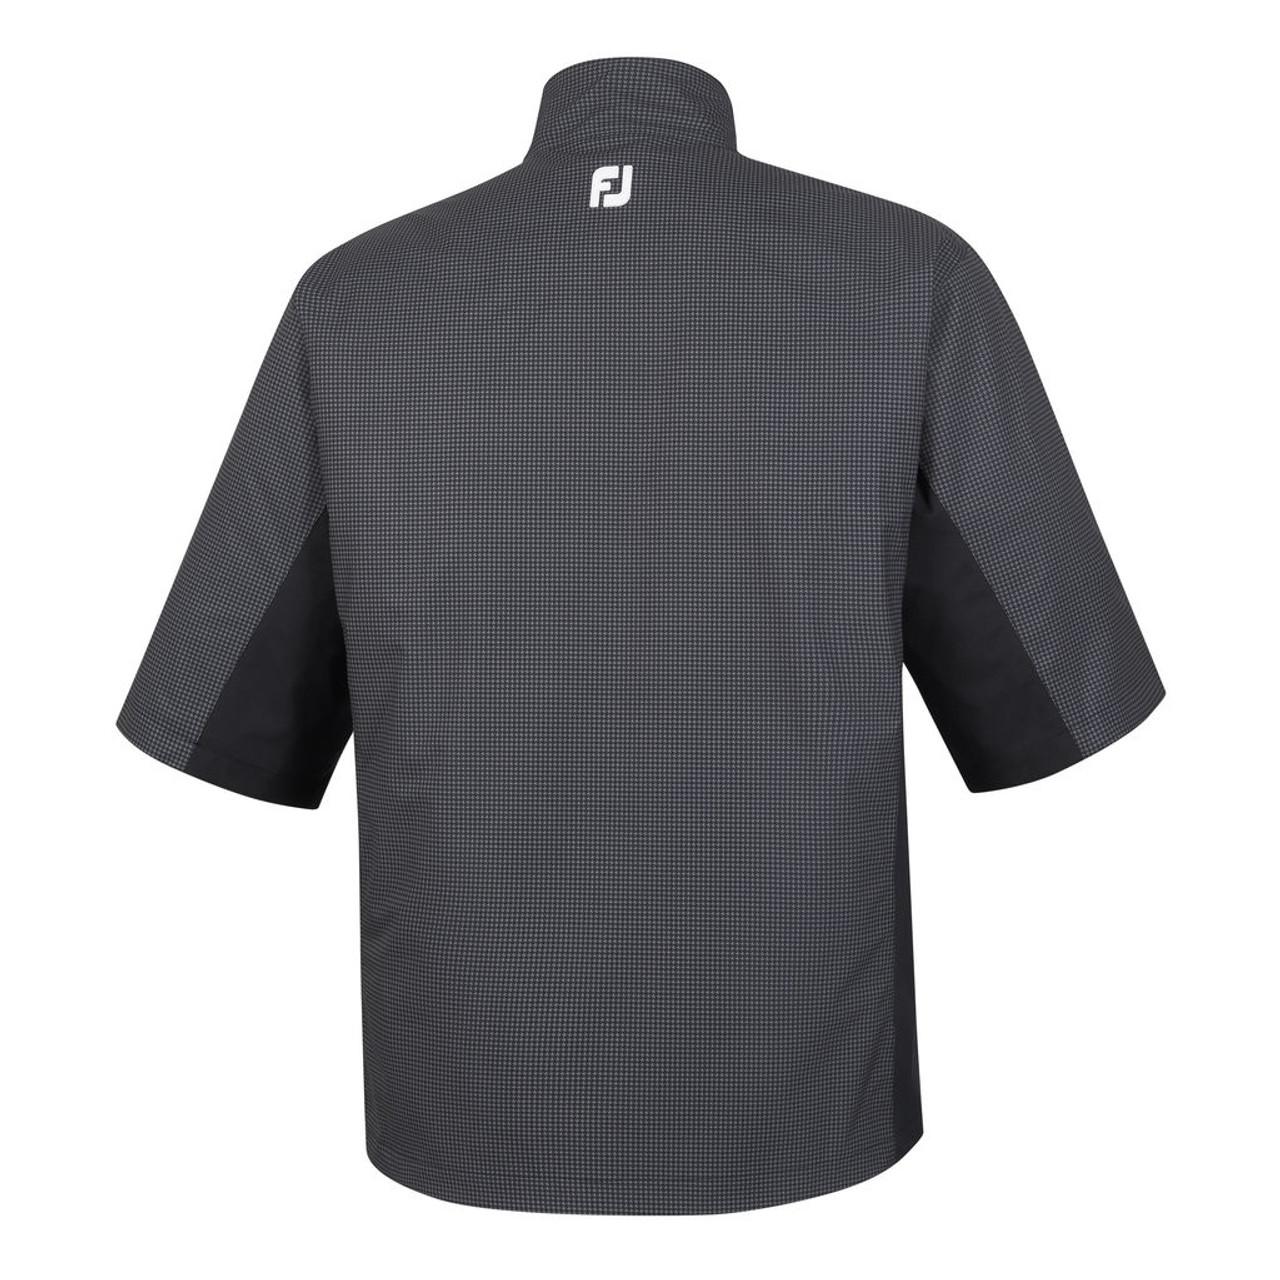 FootJoy FJ Hydrolite Short Sleeve Rain Shirt - Charcoal / Black Houndstooth (23778)